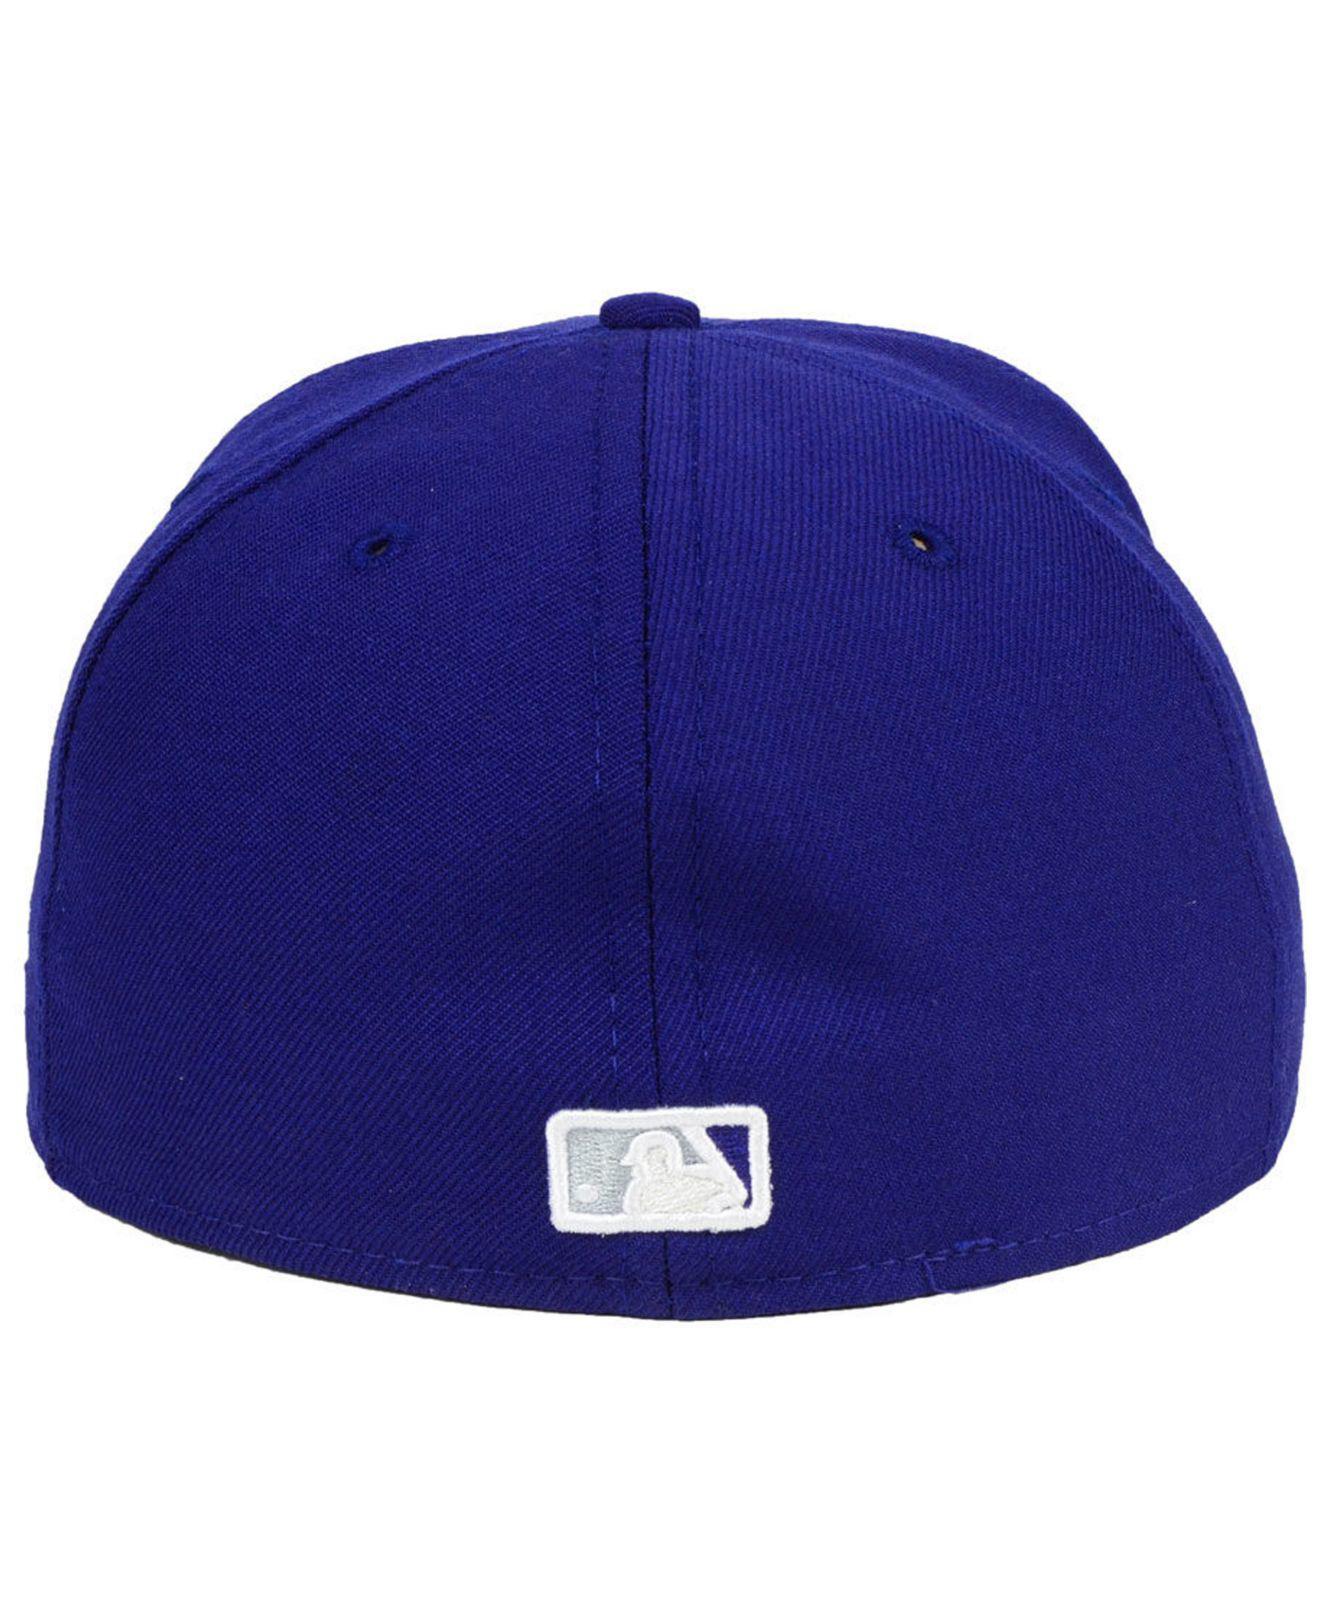 a2edd4e74c8 Lyst - Ktz Los Angeles Dodgers Custom Color 59fifty Cap in Blue for Men